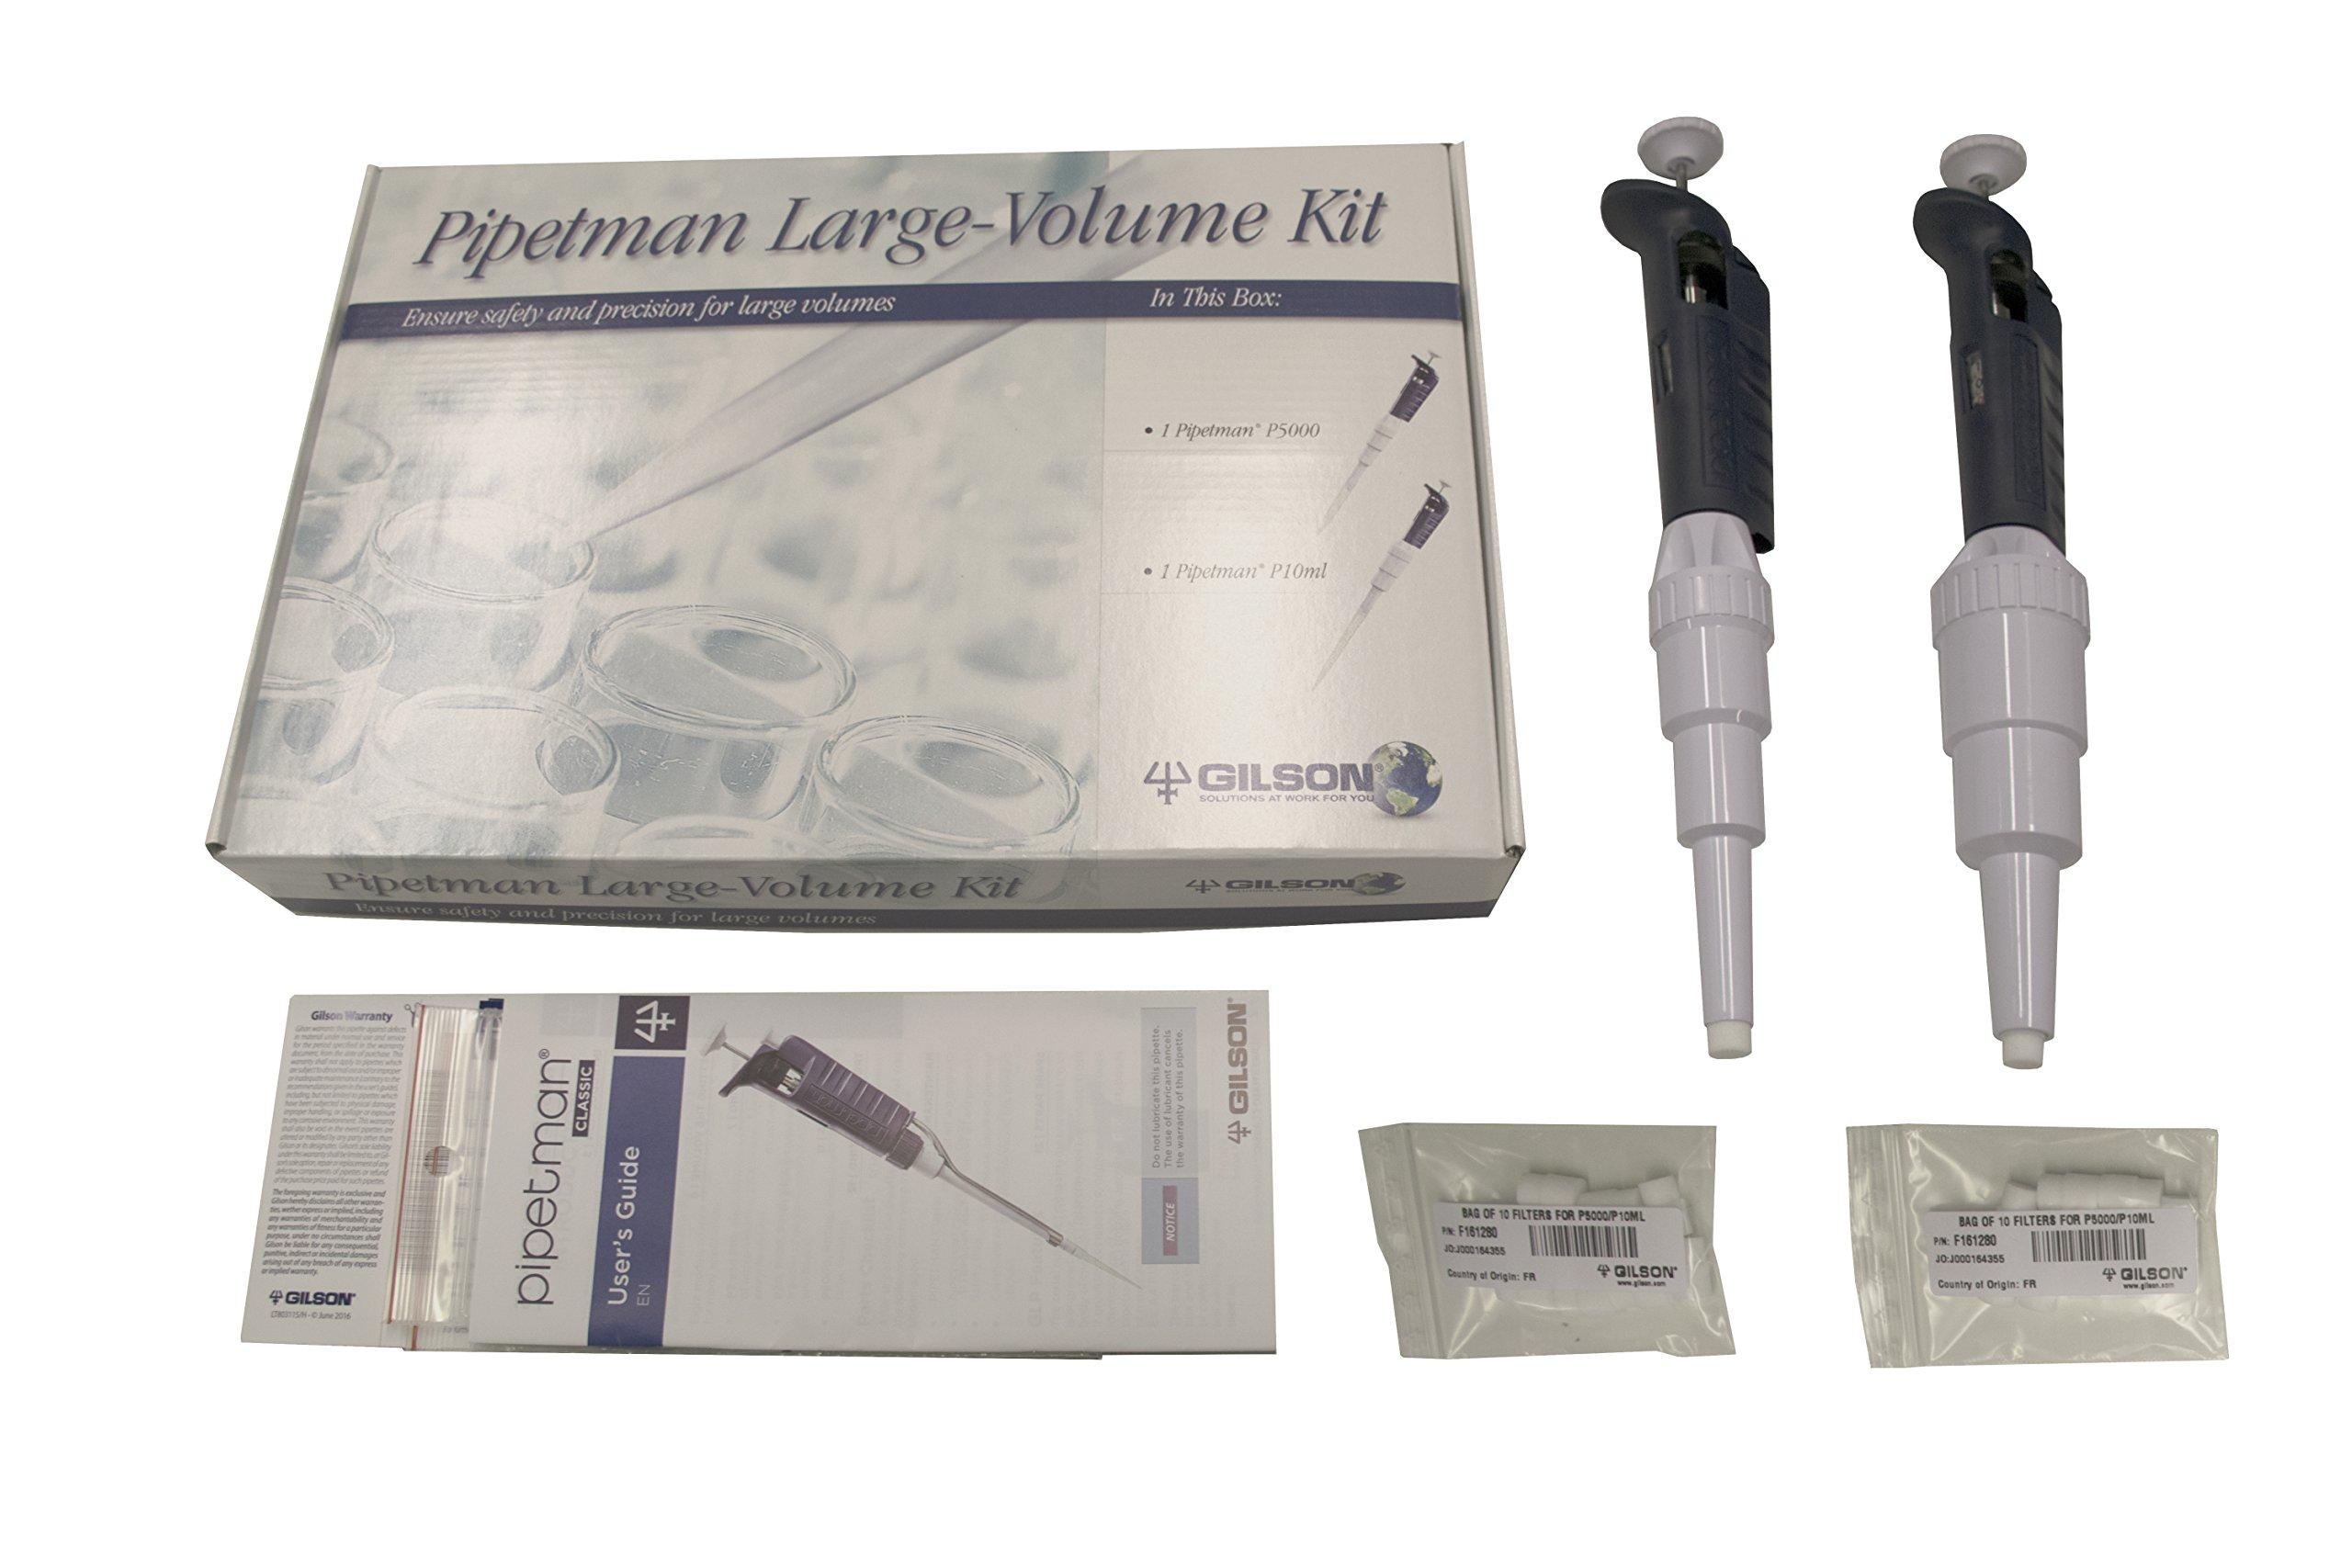 Gilson F167400 PIPETMAN Classic Large Volume Starter Kit Single Channel Pipettes: P5000, P10 mL, PVDF